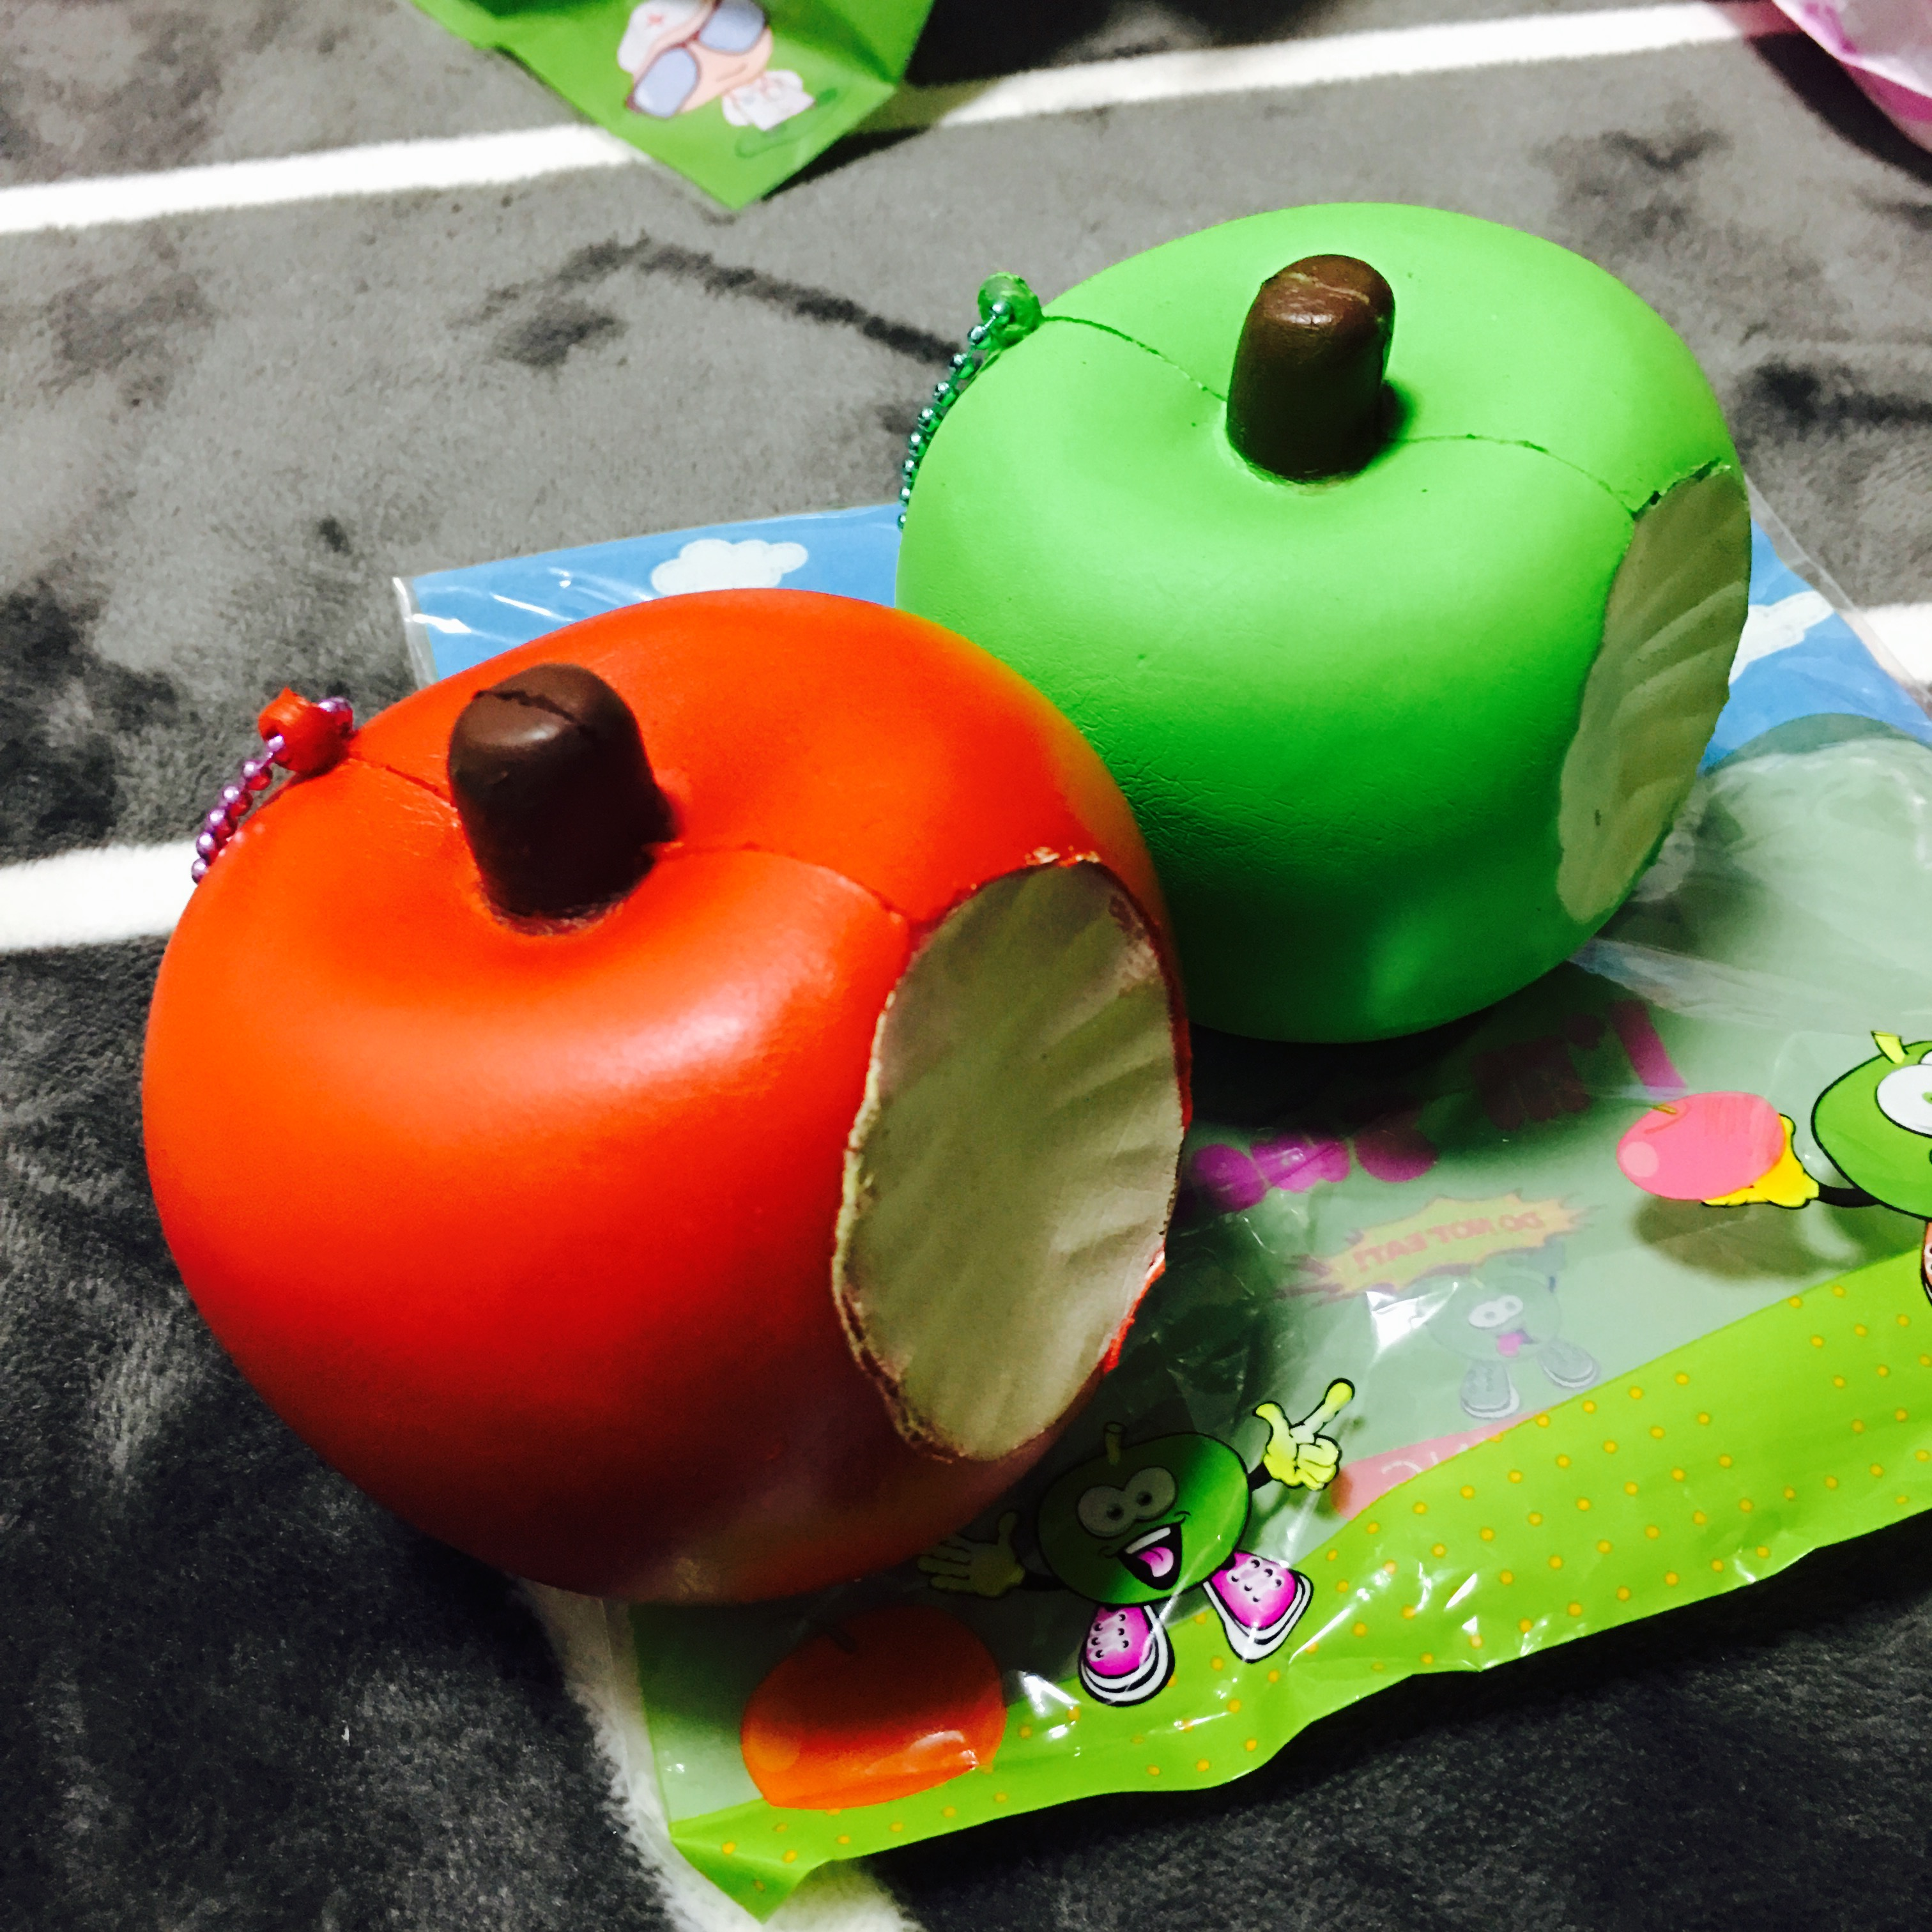 Large Squishy Ball : ~SquishyStuff~ Large Bitten Apple Squishy Ball Chain Online Store Powered by Storenvy